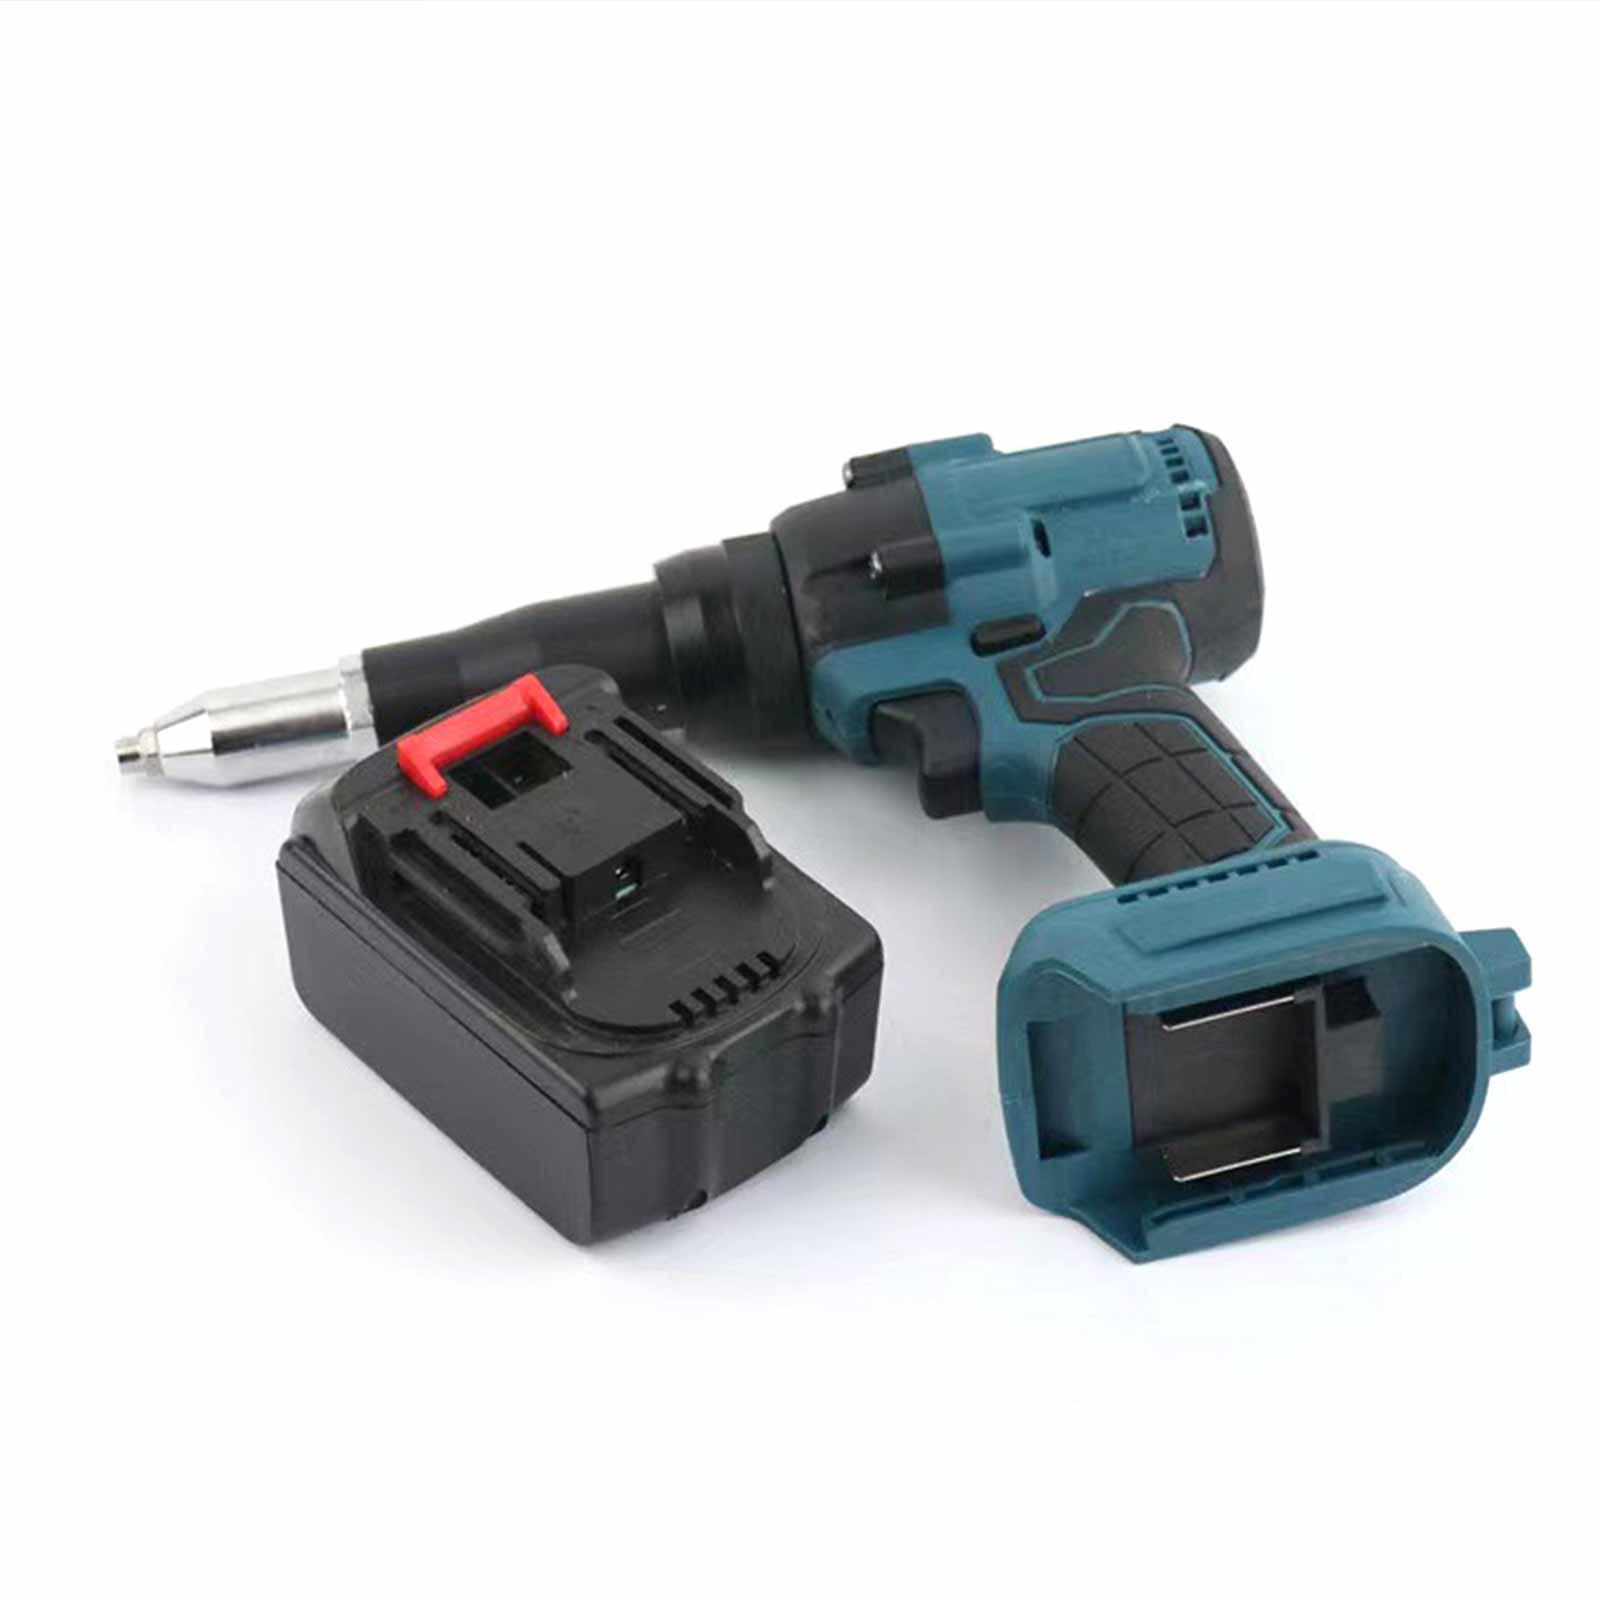 Electric Rivet Gun 3.2/4.8/5.2mm Rivet Nut Gun Drill Adapter Cordless Riveting Tool Insert Nut Pull Rivet Tool